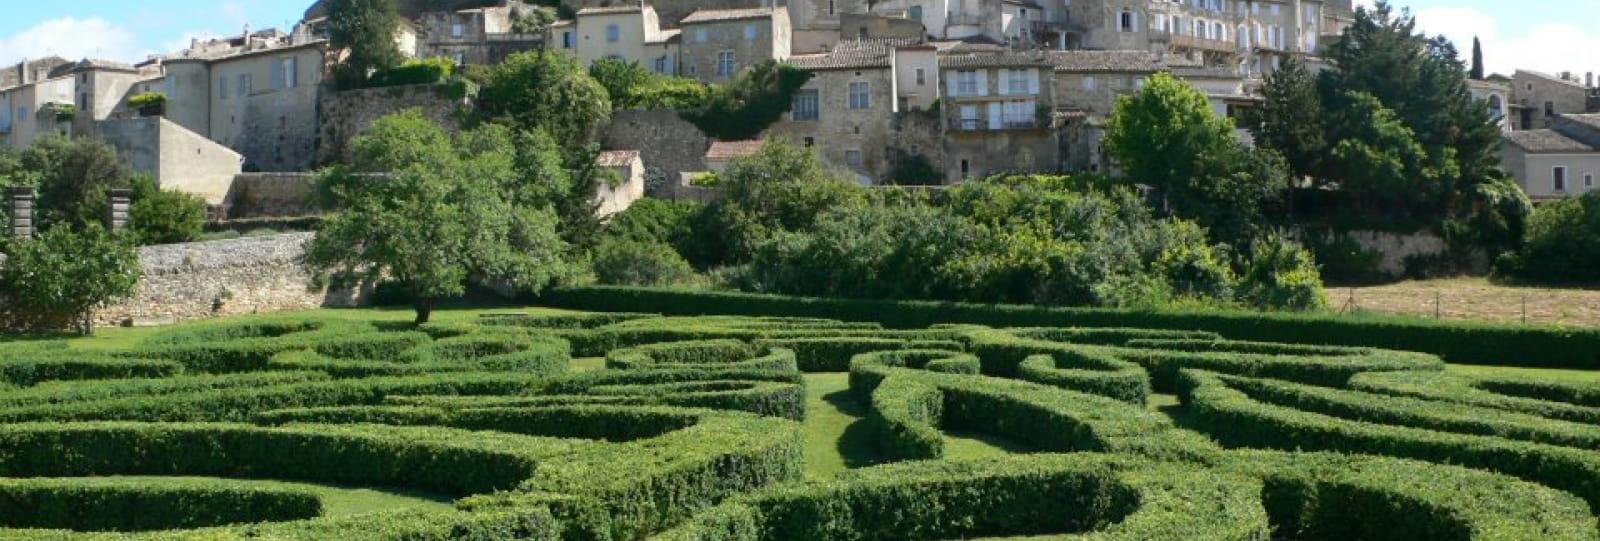 Le labyrinthe - Jardin Sévigné